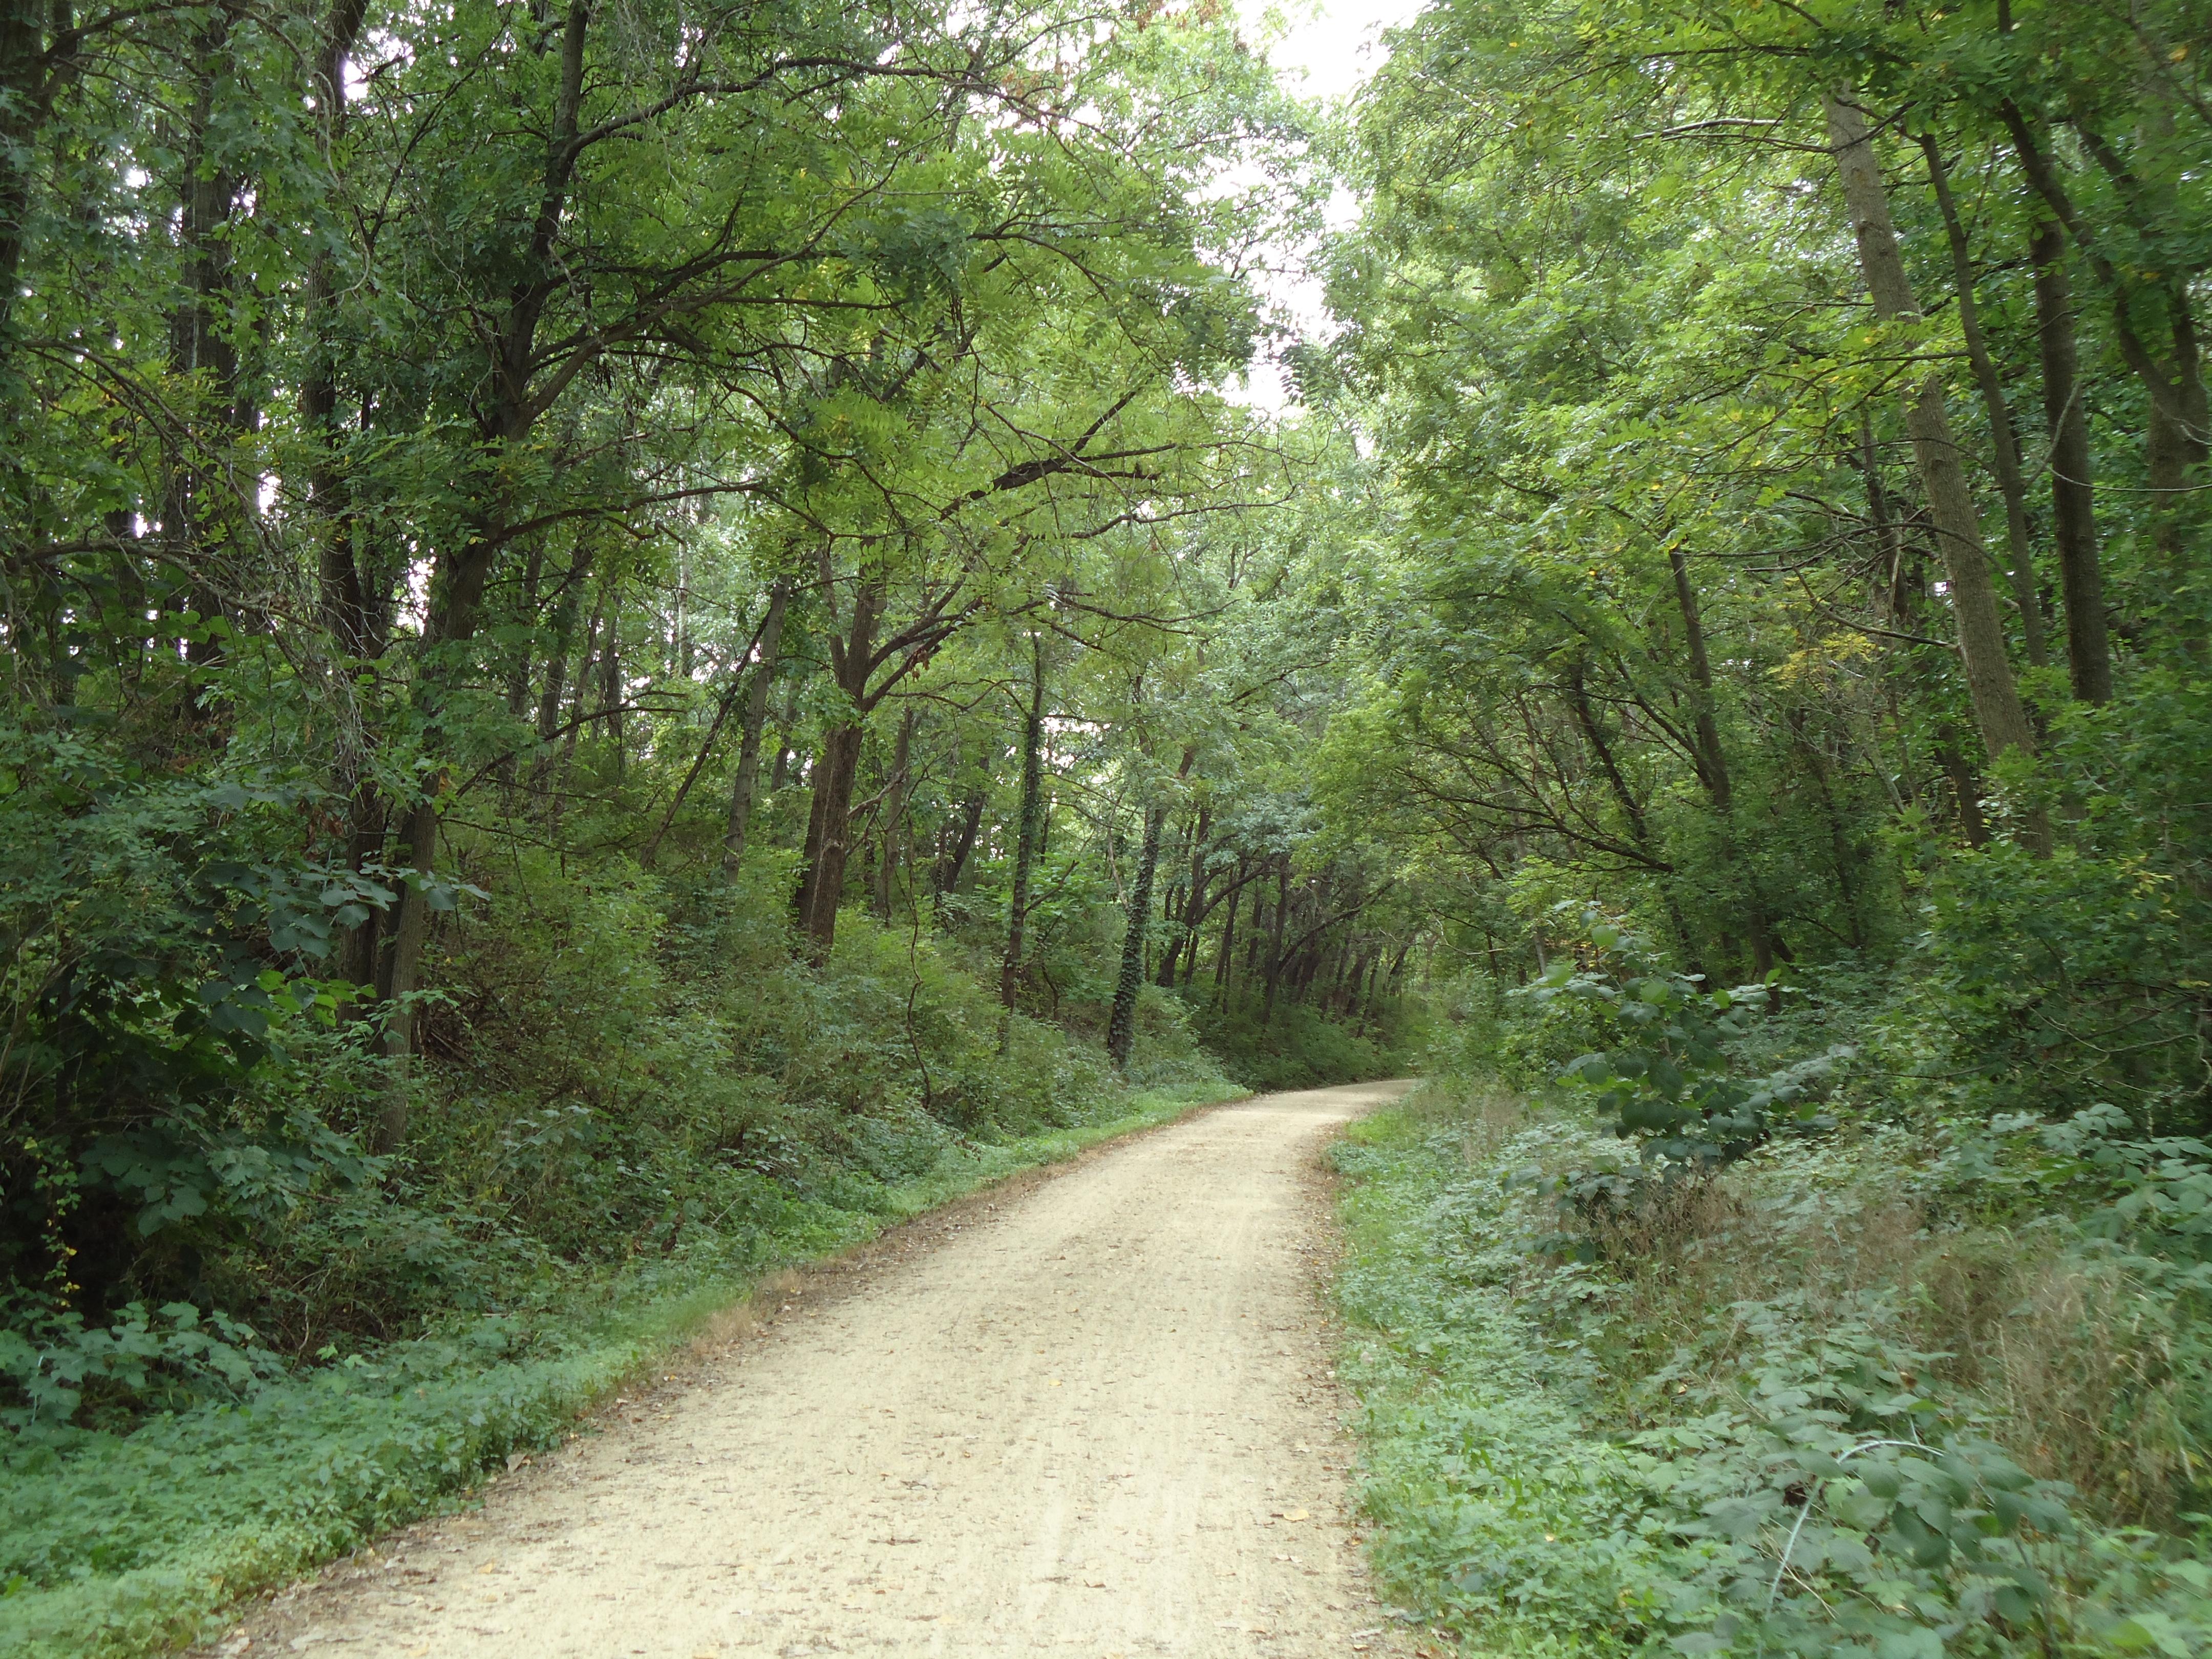 Download The Oregon Trail 2 for Windows (Windows)